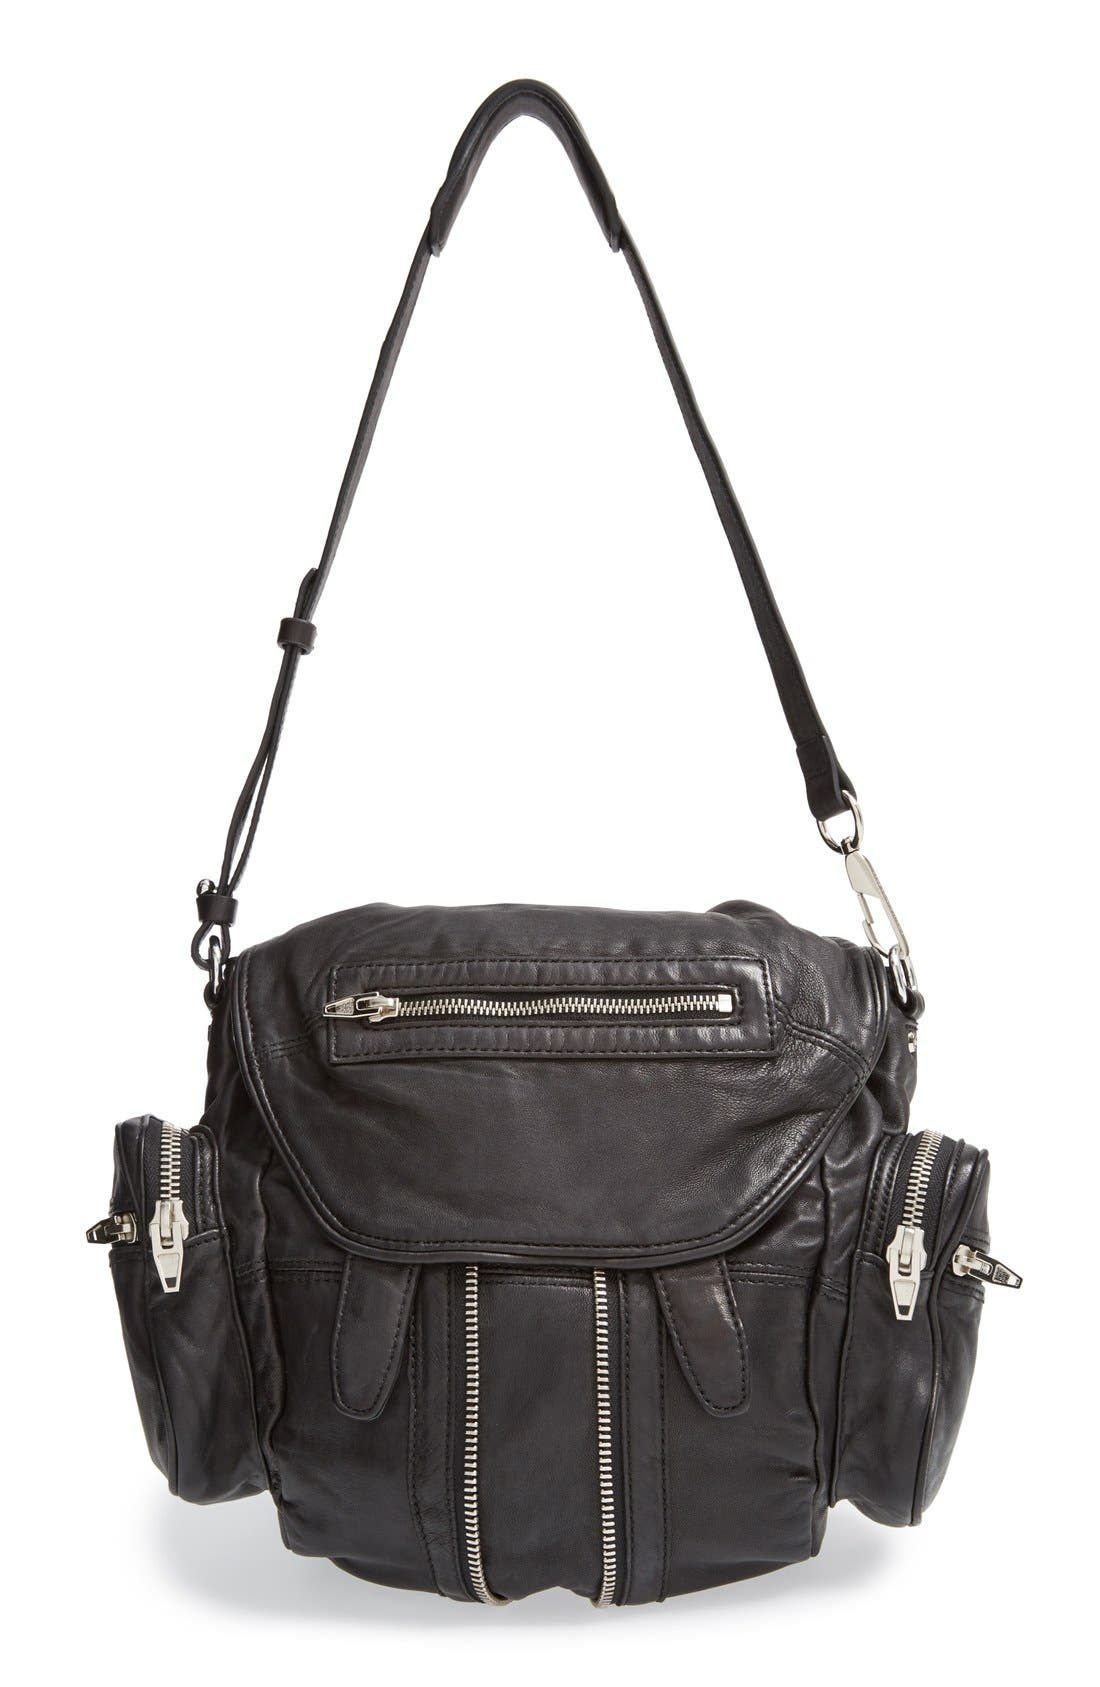 ALEXANDER WANG, 'Mini Marti' Leather Backpack, Main thumbnail 1, color, BLACK SLVR HRDR